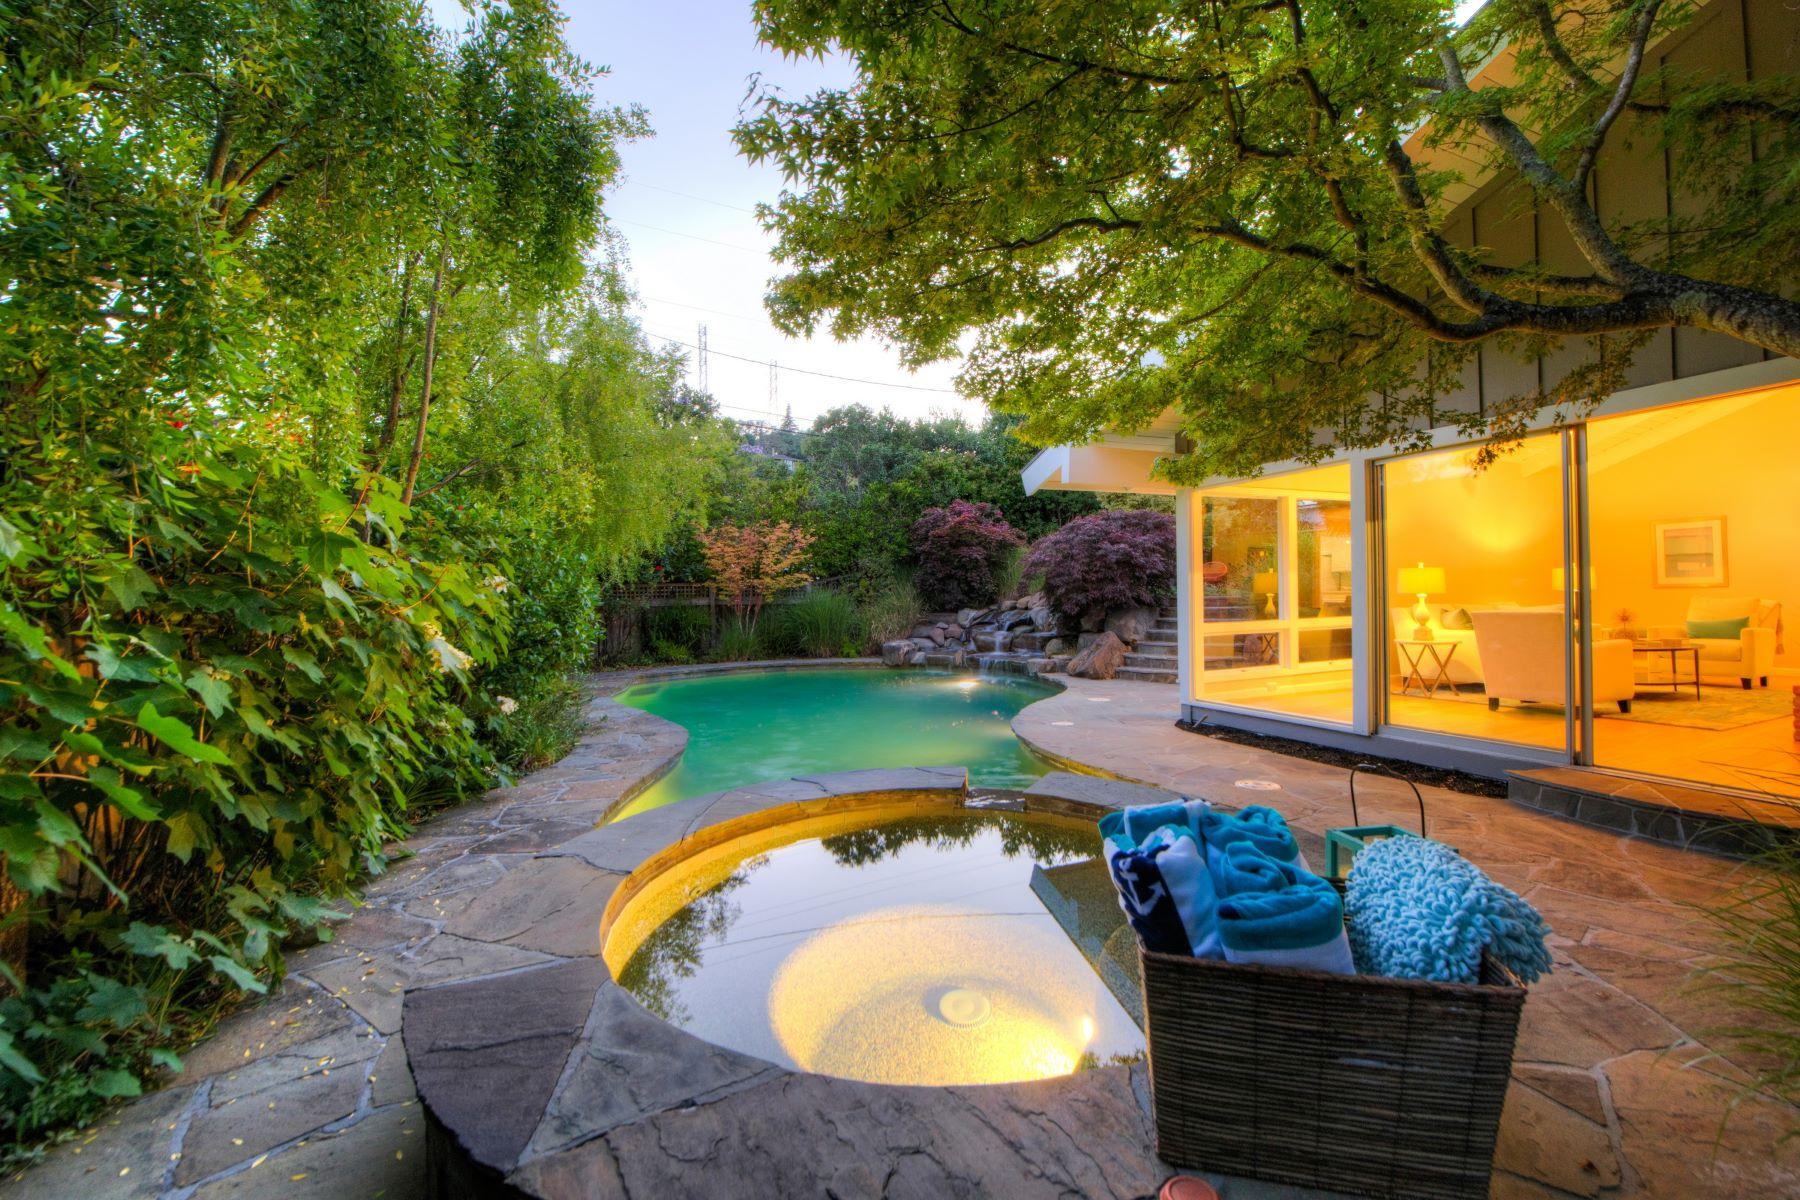 獨棟家庭住宅 為 出售 在 One Level Private Resort-Like Home! 26 Las Casas San Rafael, 加利福尼亞州, 94901 美國